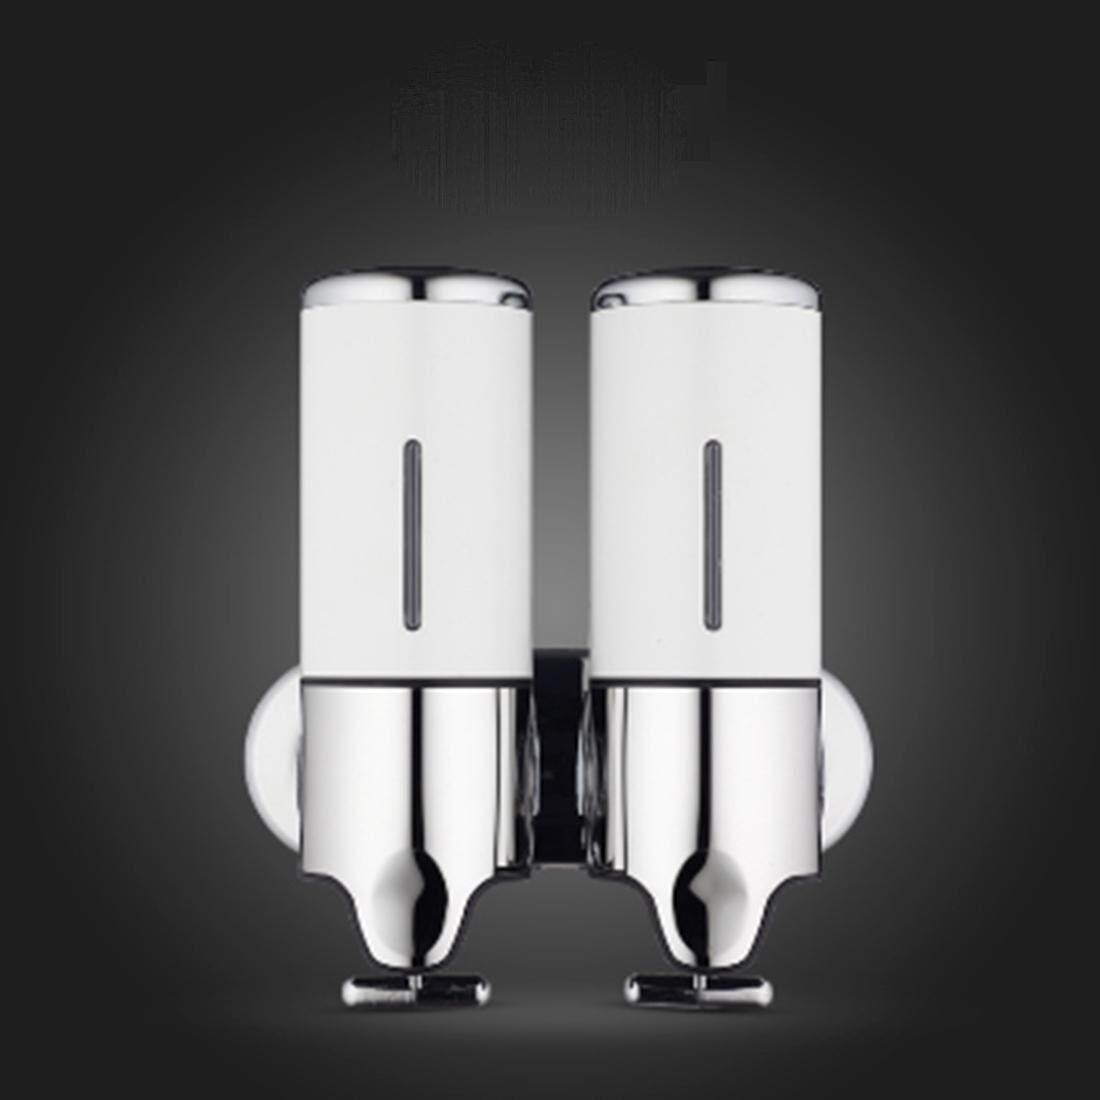 Hotel Pancuran Manual Dispenser Rumah Tangga Anti Karat Cuci Cair Sampo Botol Sabun, Kapasitas: 1000 Ml (Putih) -Internasional